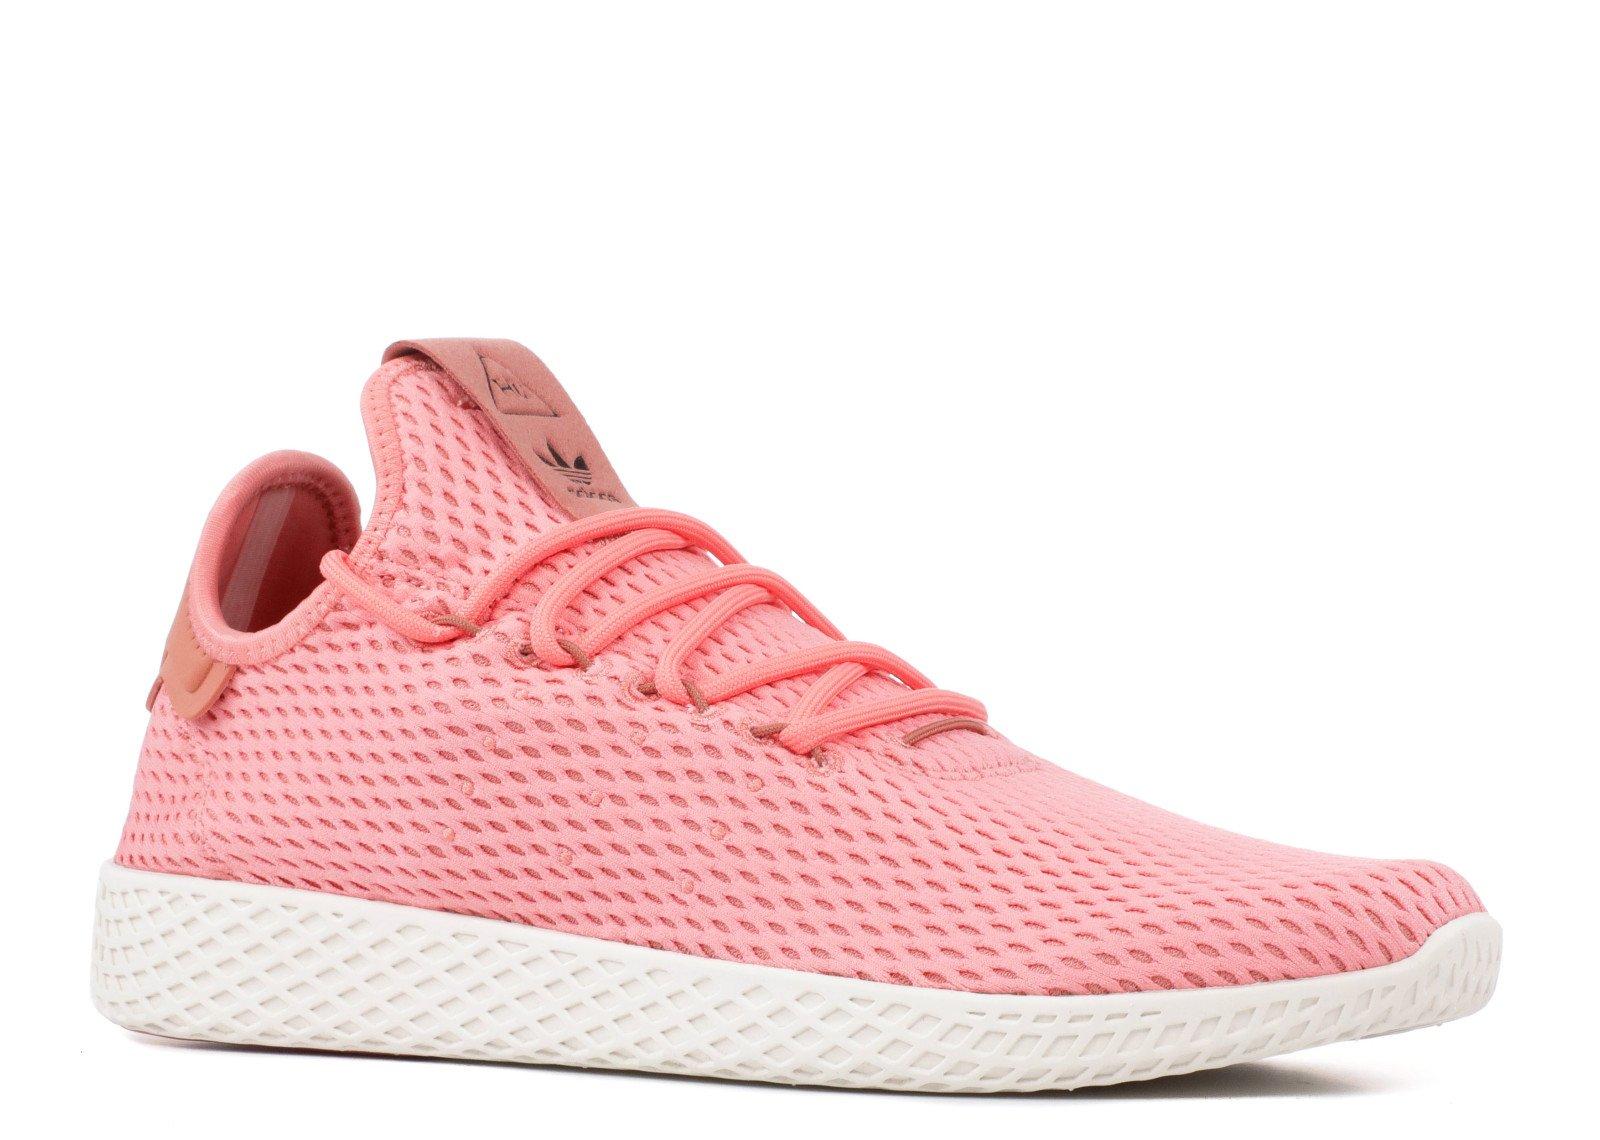 galeone adidas williams pharrell williams adidas tennis hu e01119